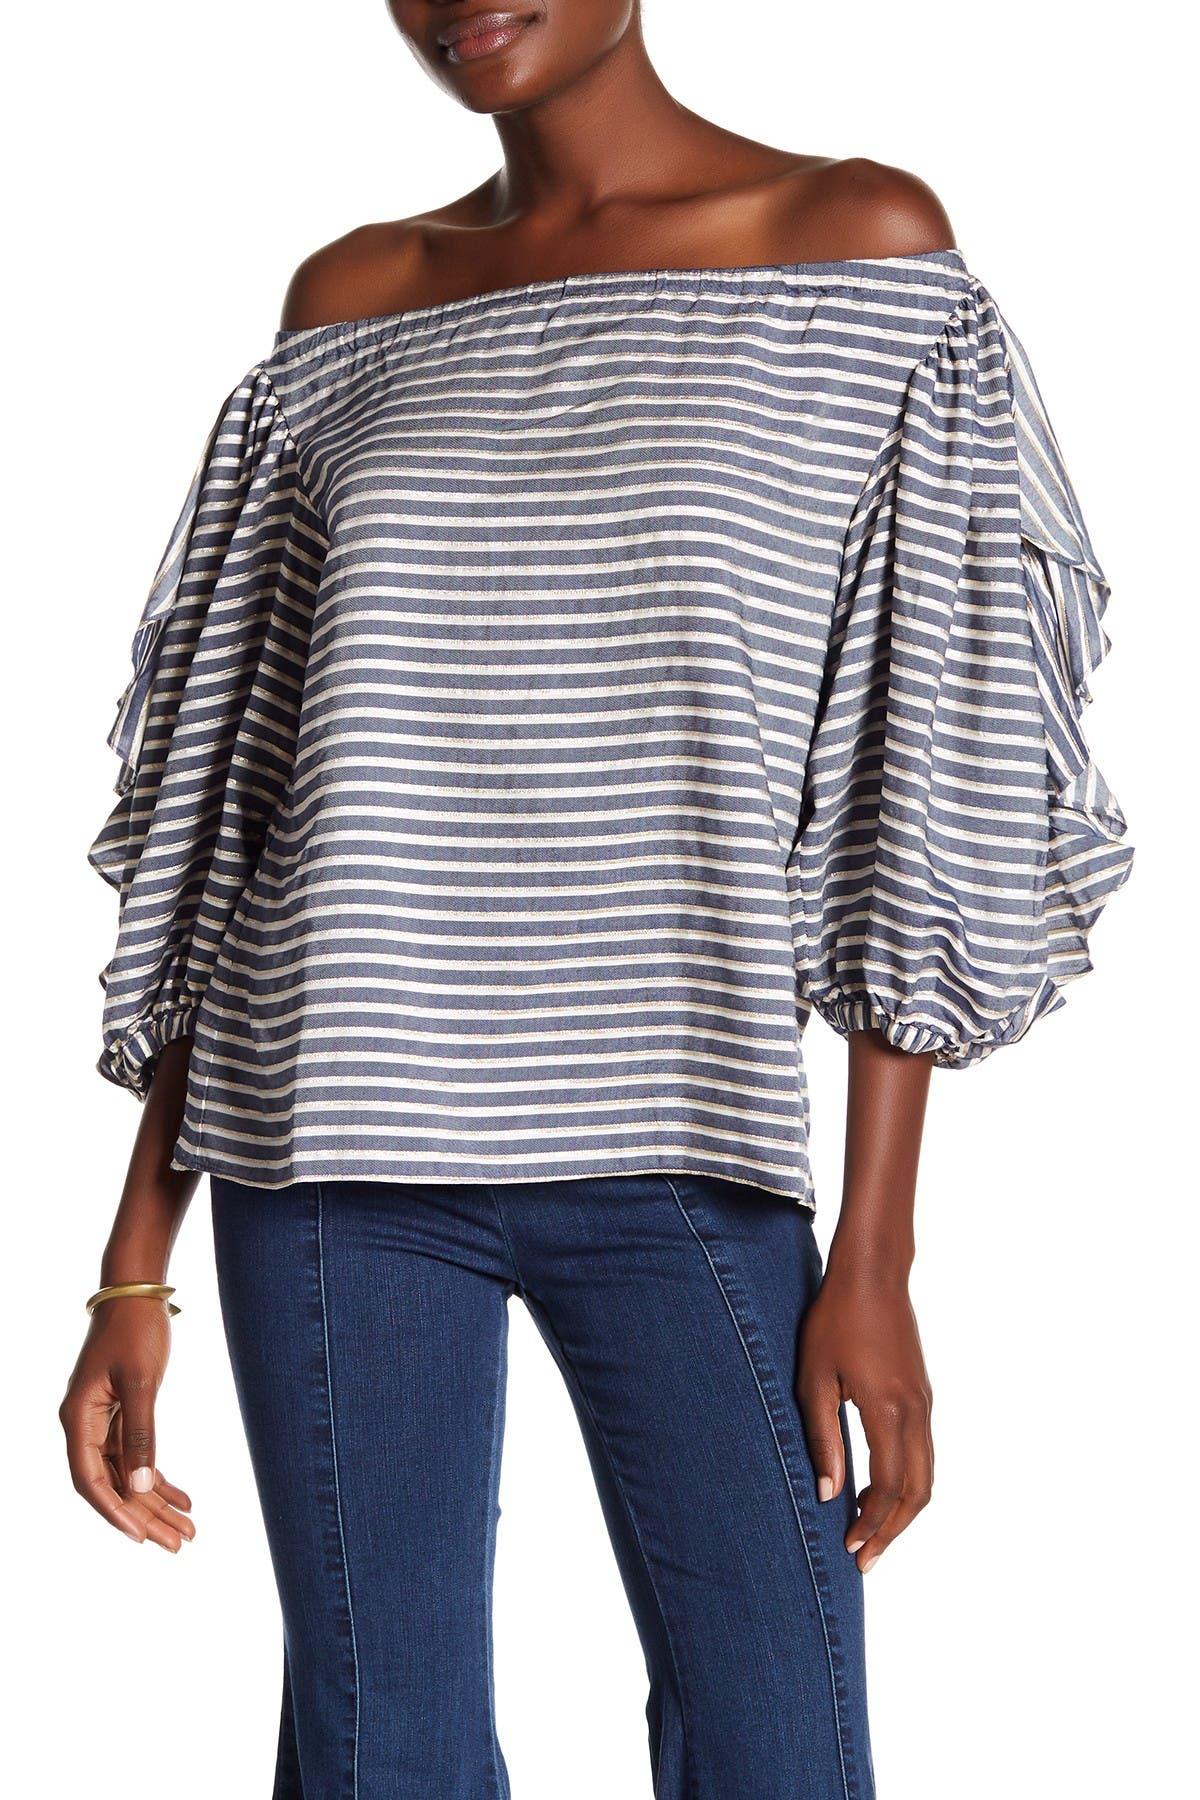 Image of RACHEL Rachel Roy Ruffle Sleeve Stripe Blouse